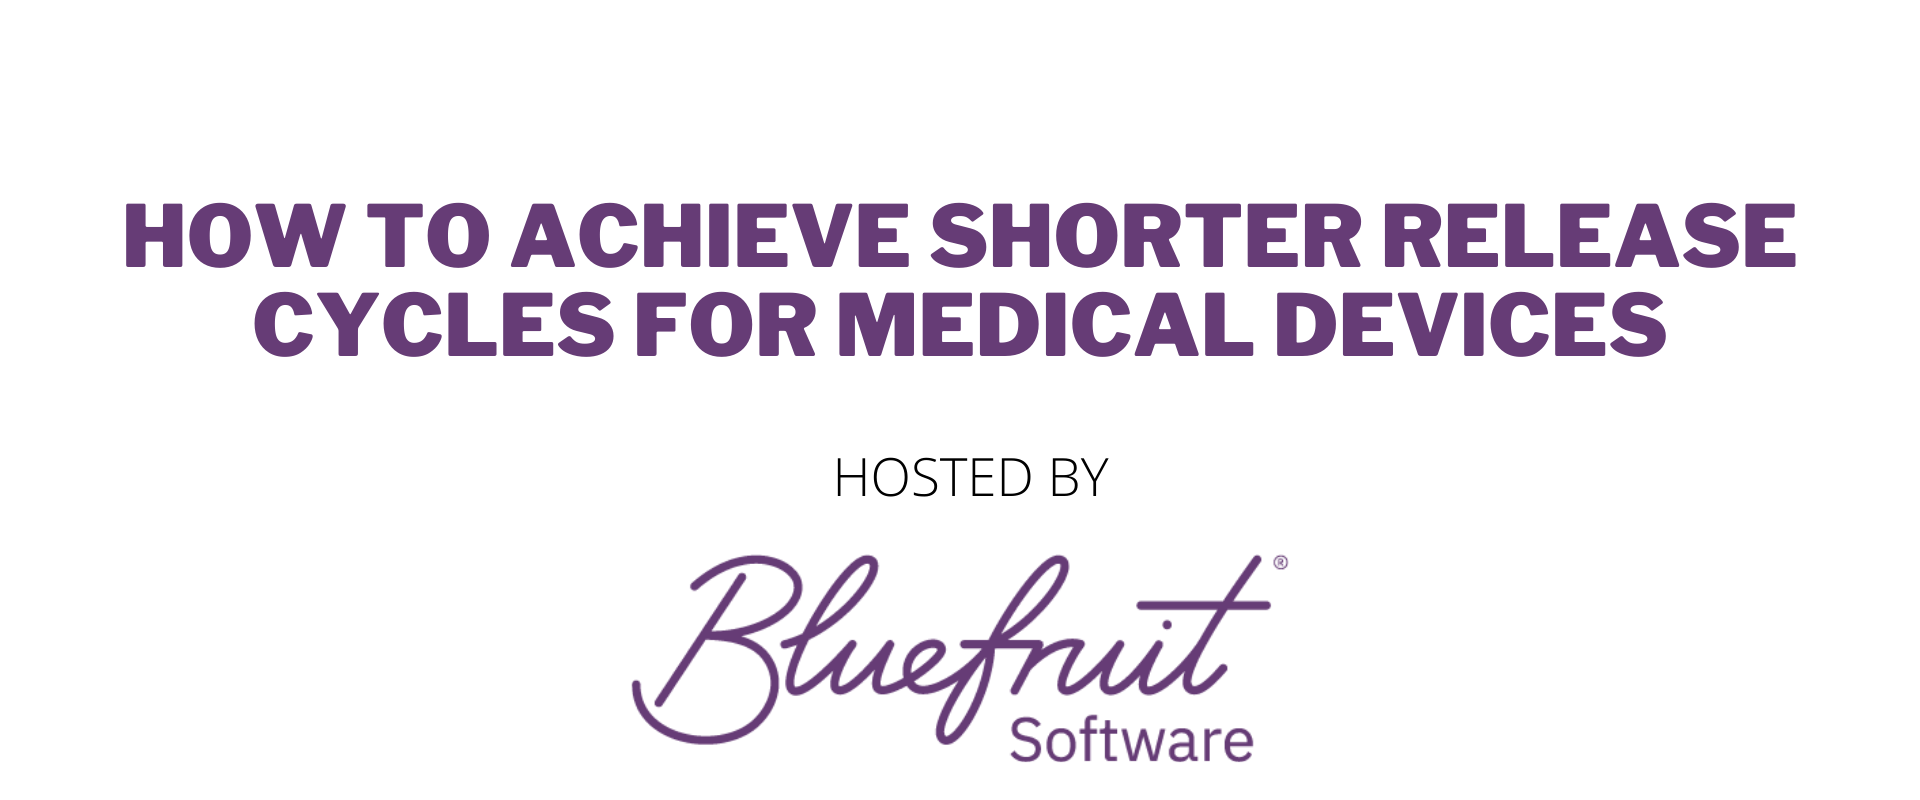 Bluefruit Software Webinar